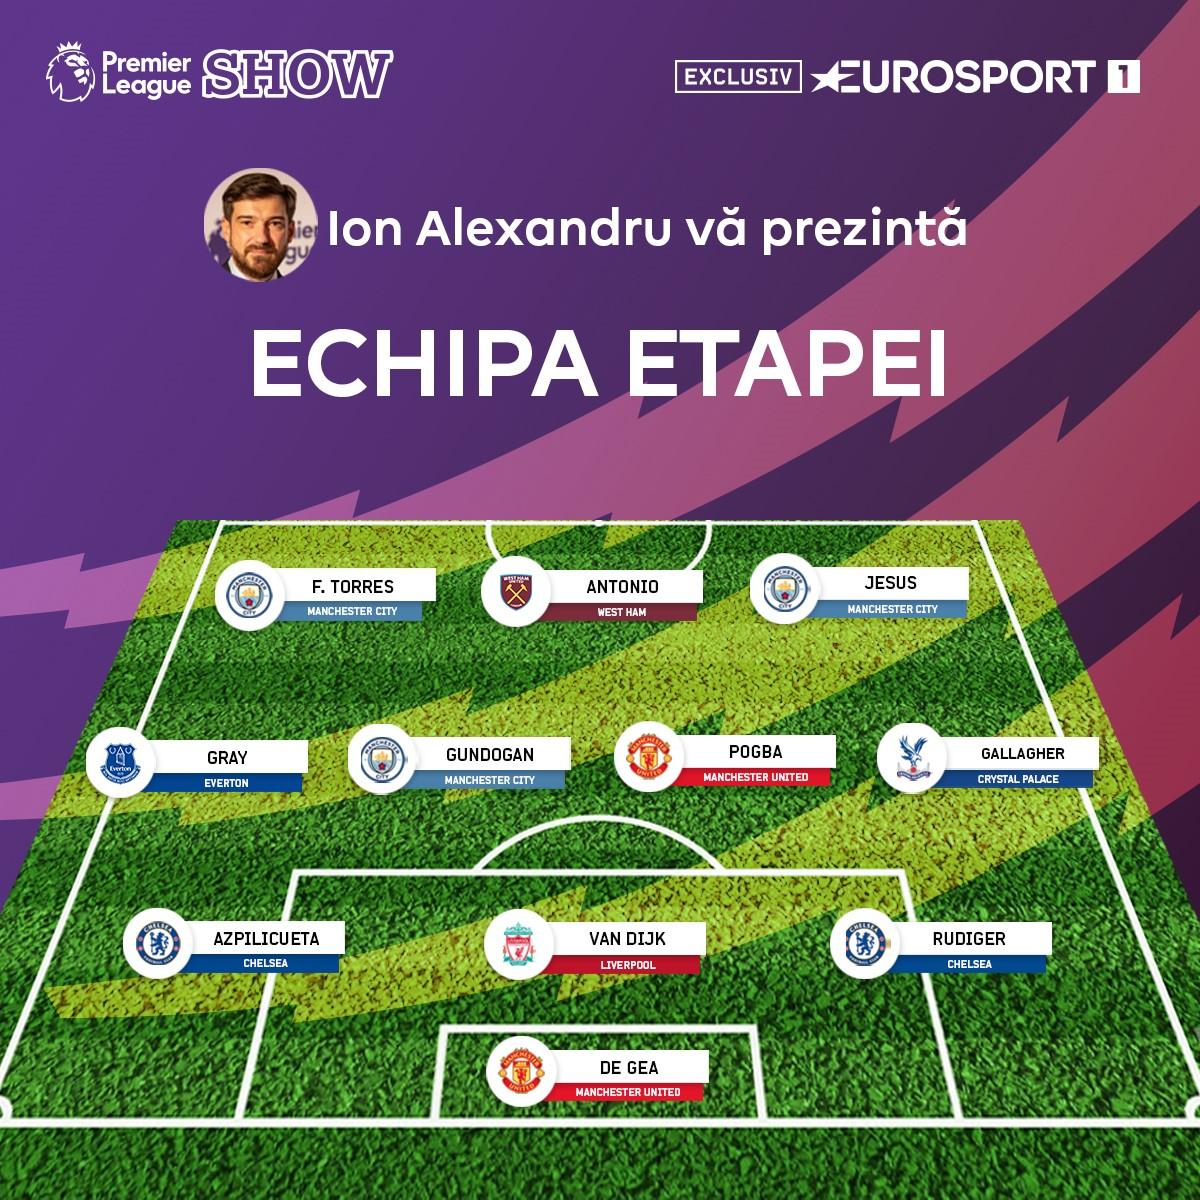 https://i.eurosport.com/2021/08/30/3209702.jpg